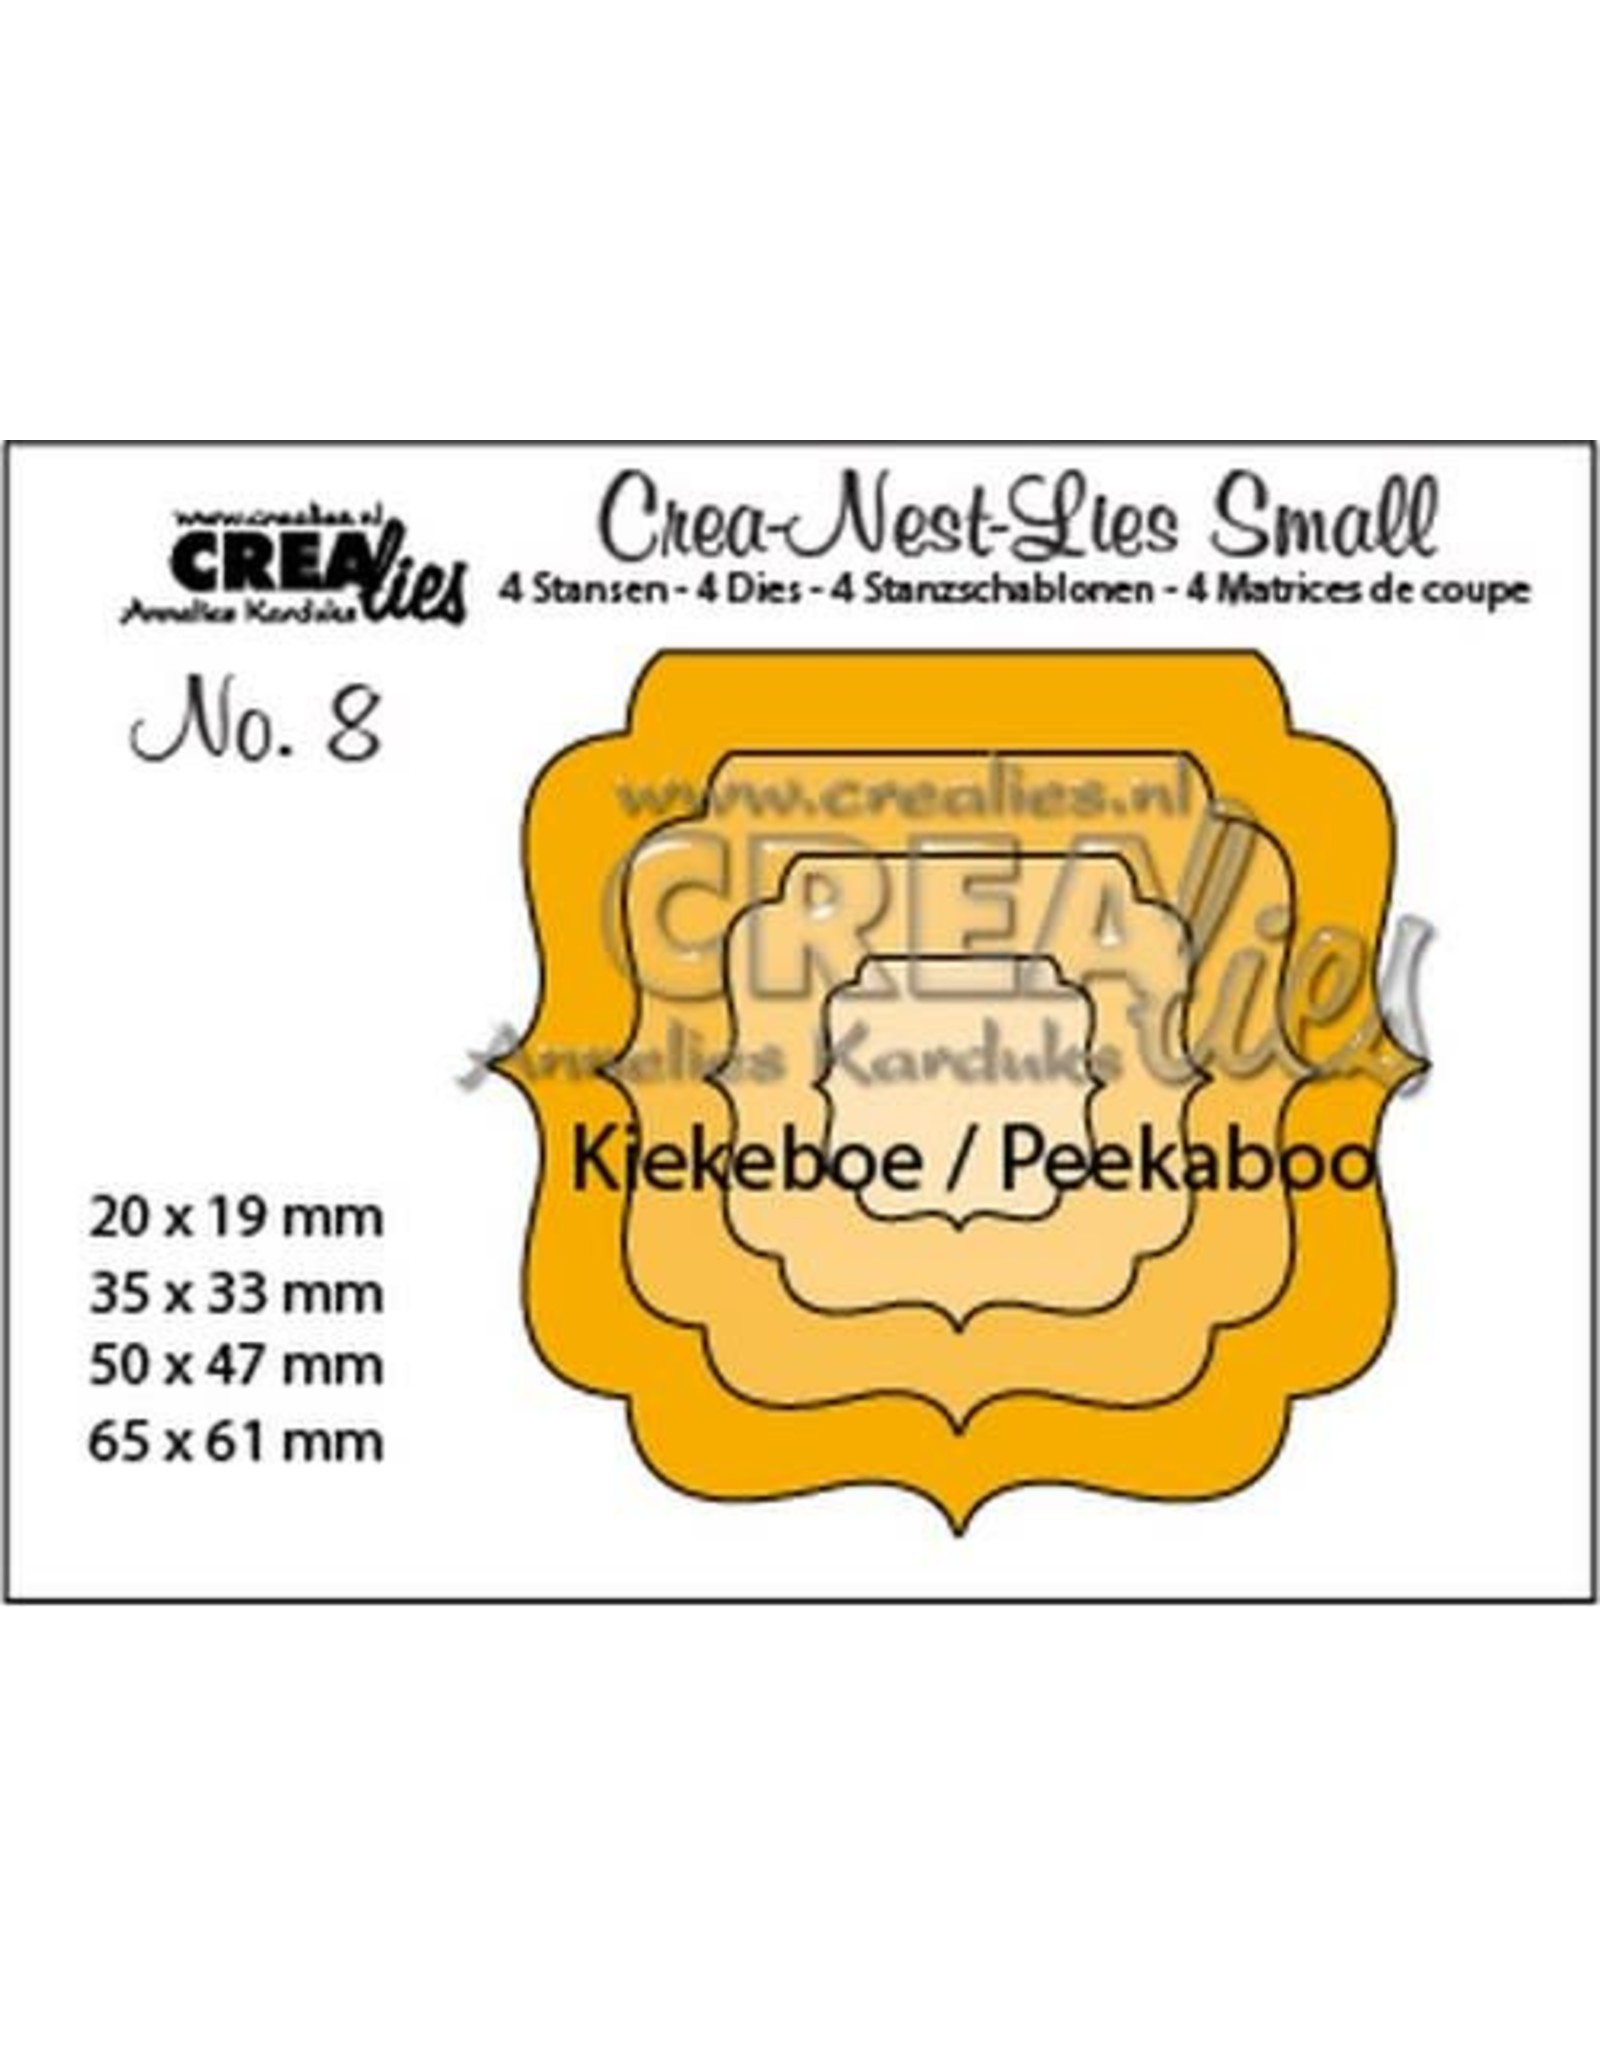 Crealies Crealies Crea-nest-dies small no. 8 Kiekeboe ornament vierkan